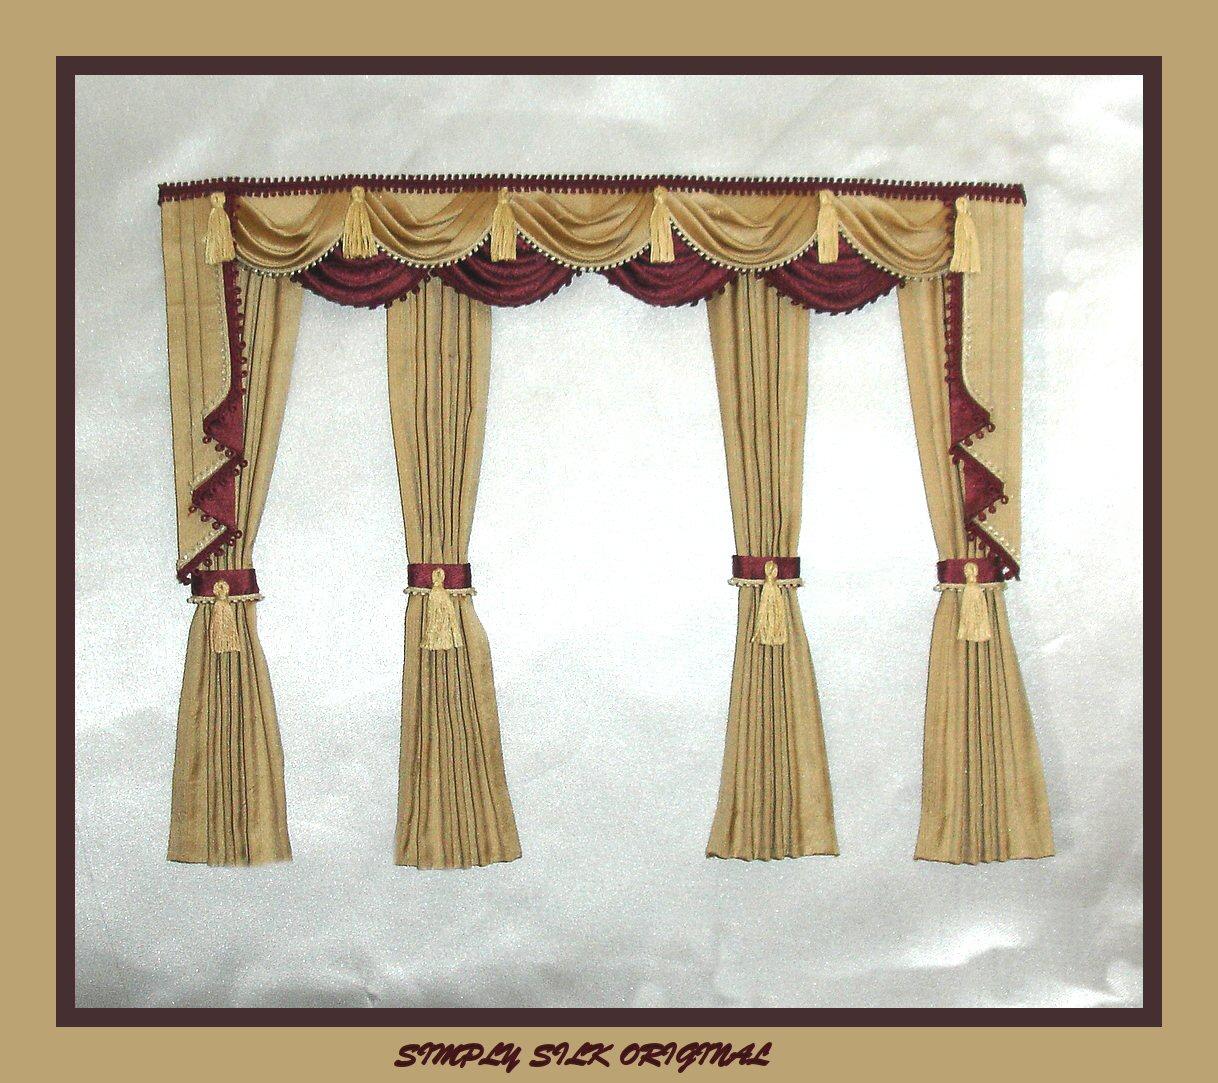 Burlap Curtain Tie Backs Curtains Diy For Sale Lined